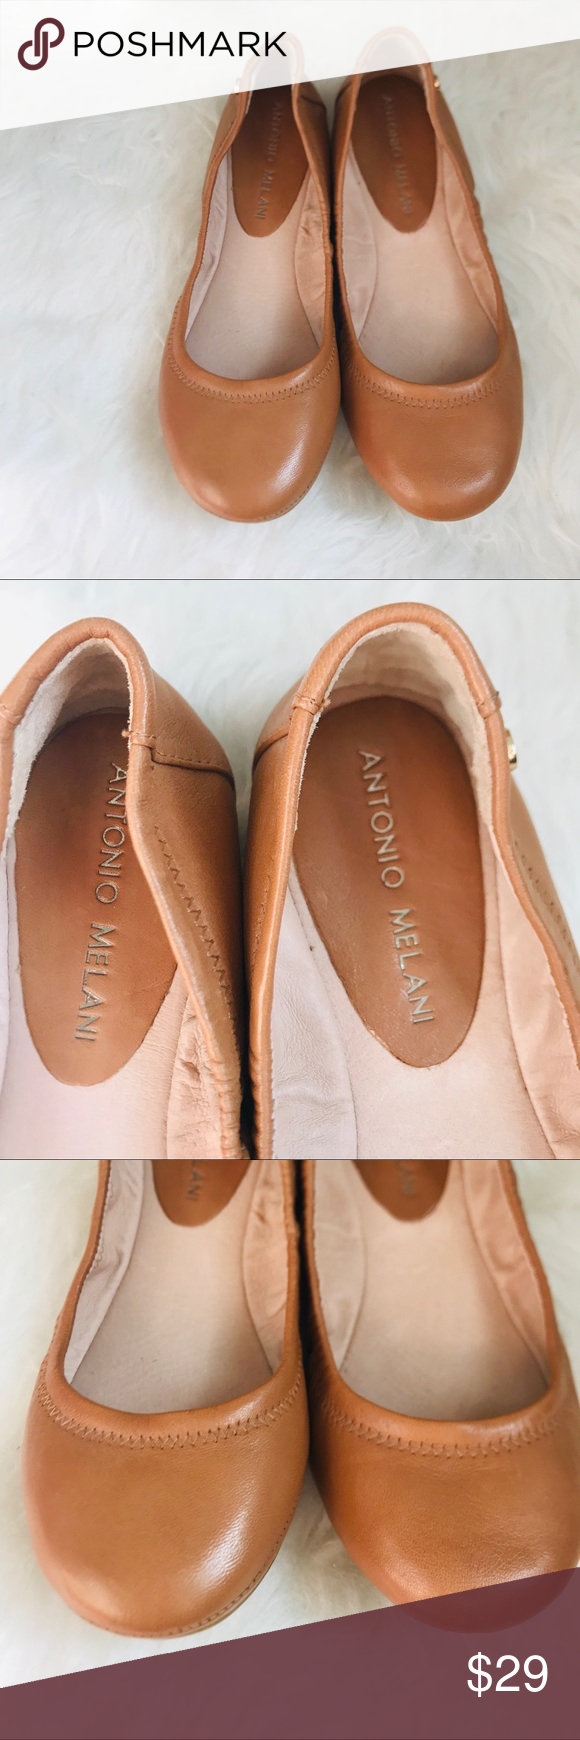 Antonio Melani Prima Leather Ballet